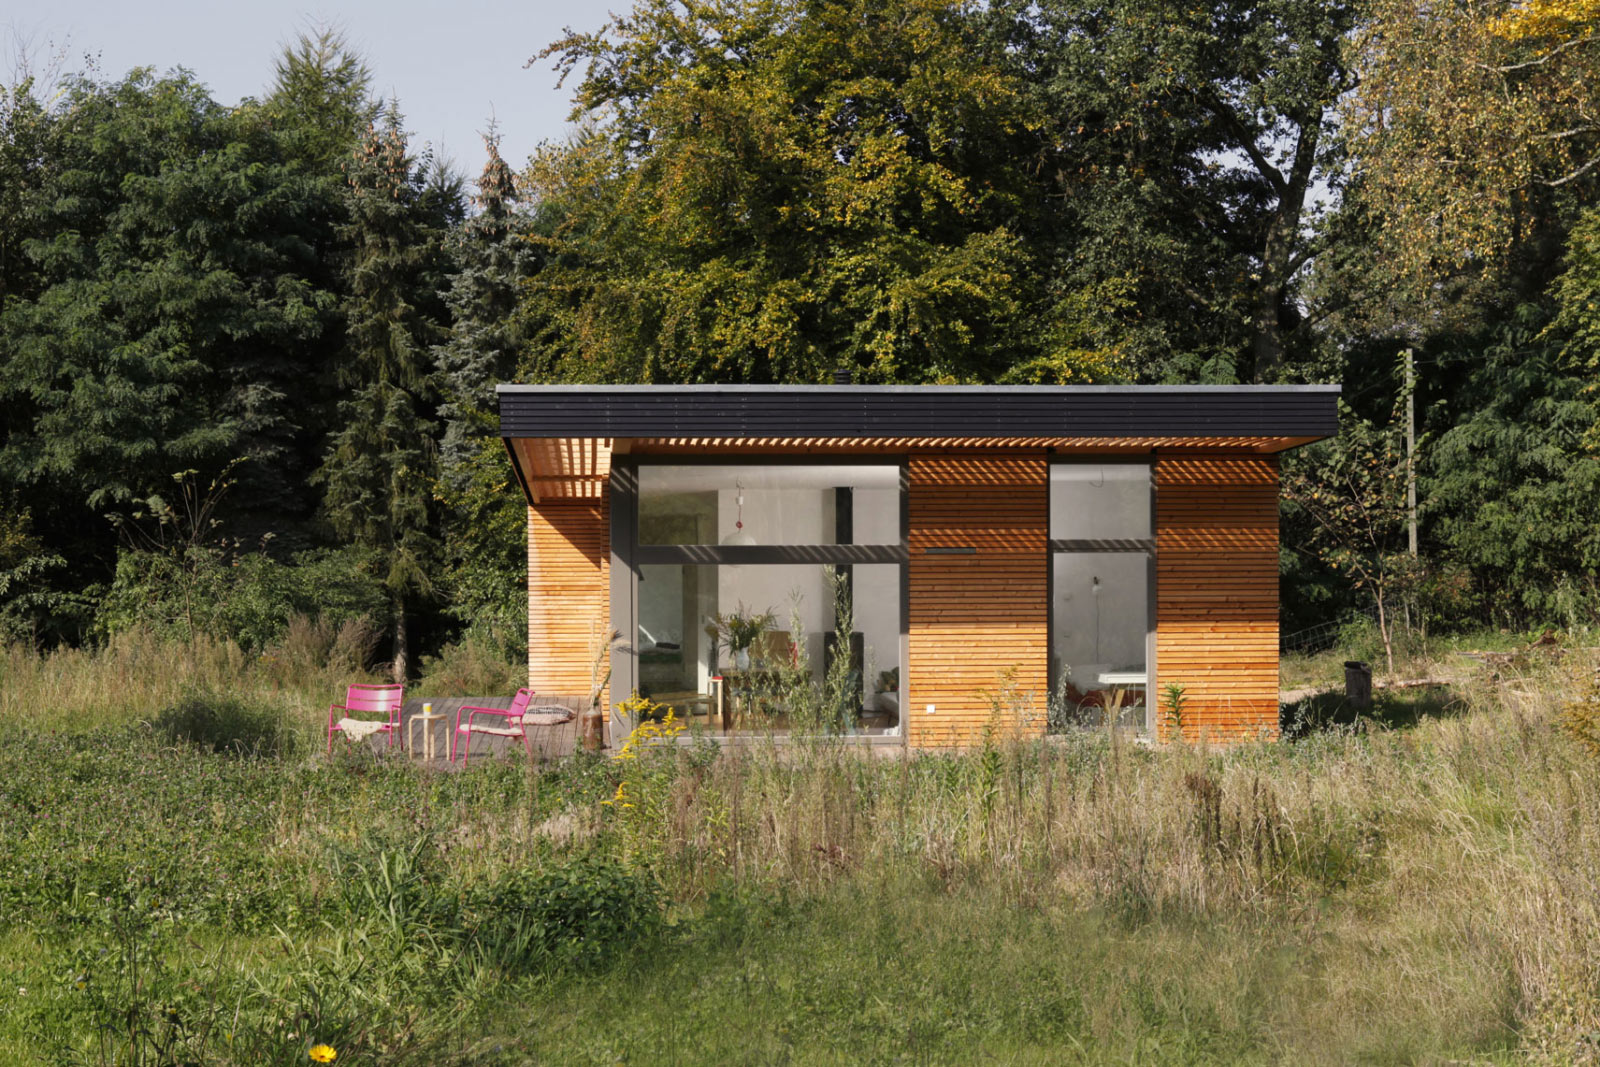 Modernes Fertighaus im Bauhausstil